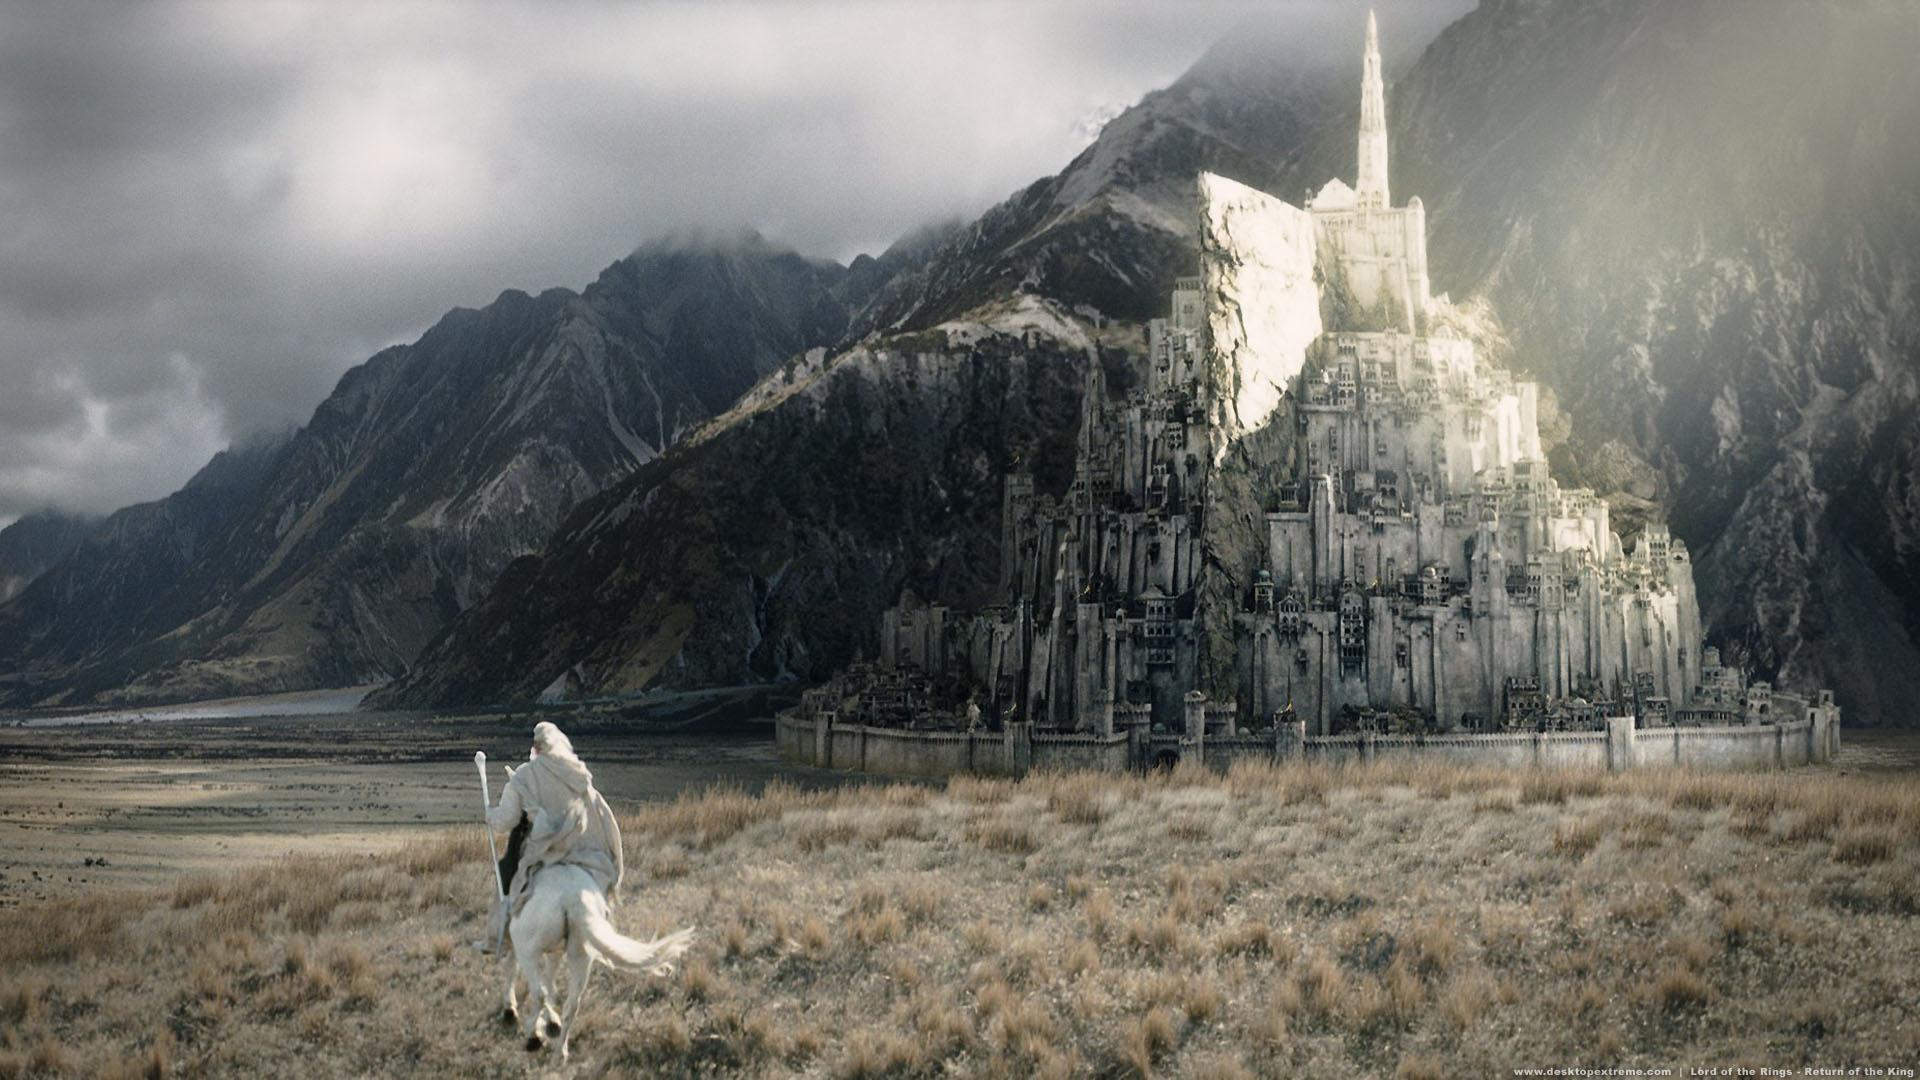 gondor rohan relationship quiz